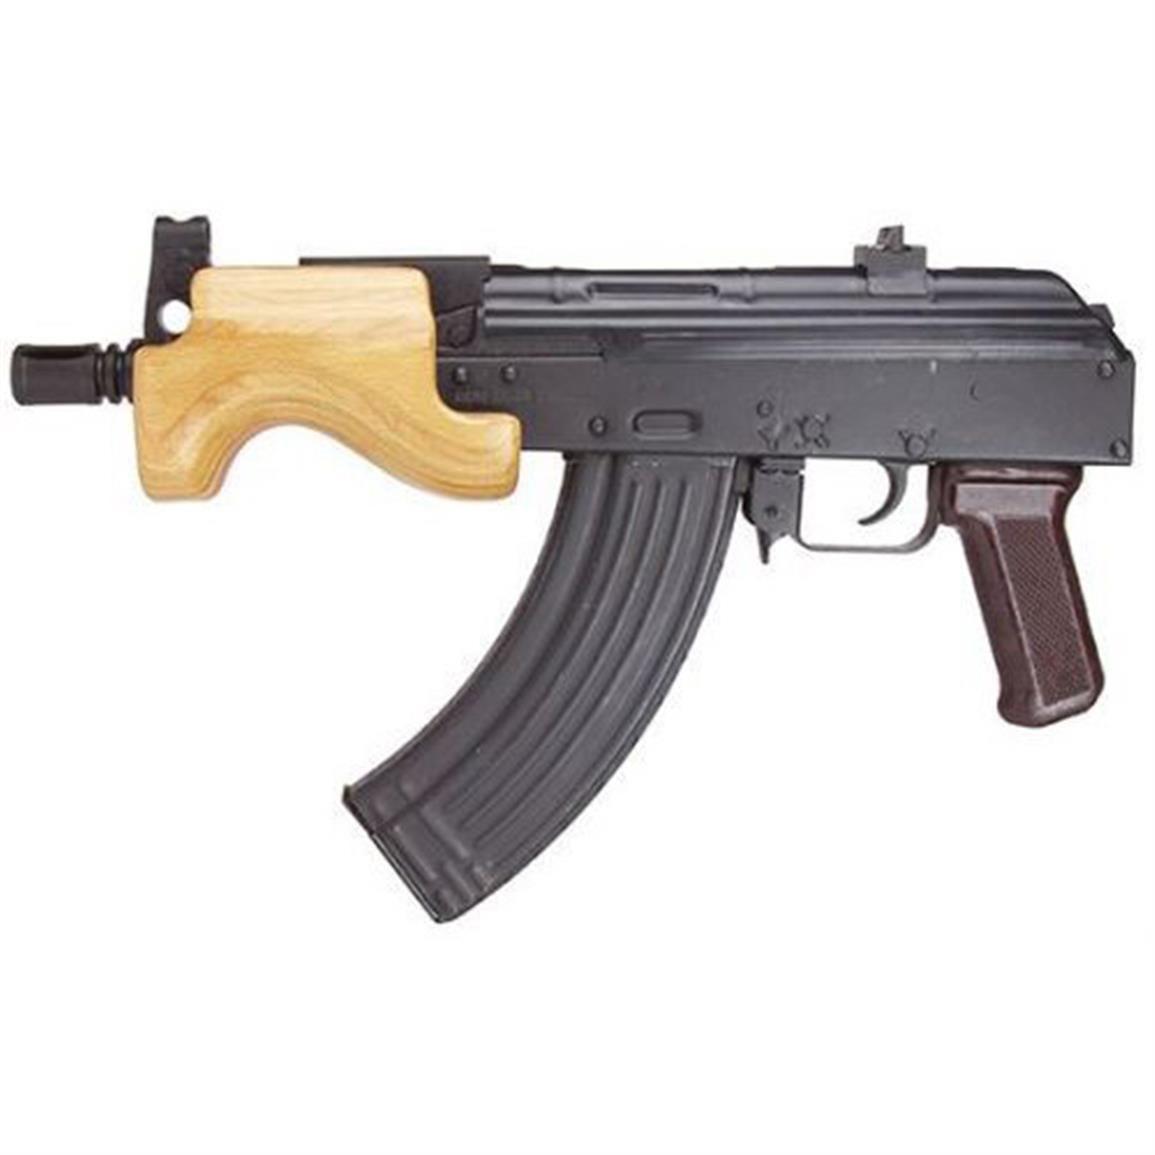 Century Arms Micro Draco AK-47 Pistol, Semi-Automatic, 7 62